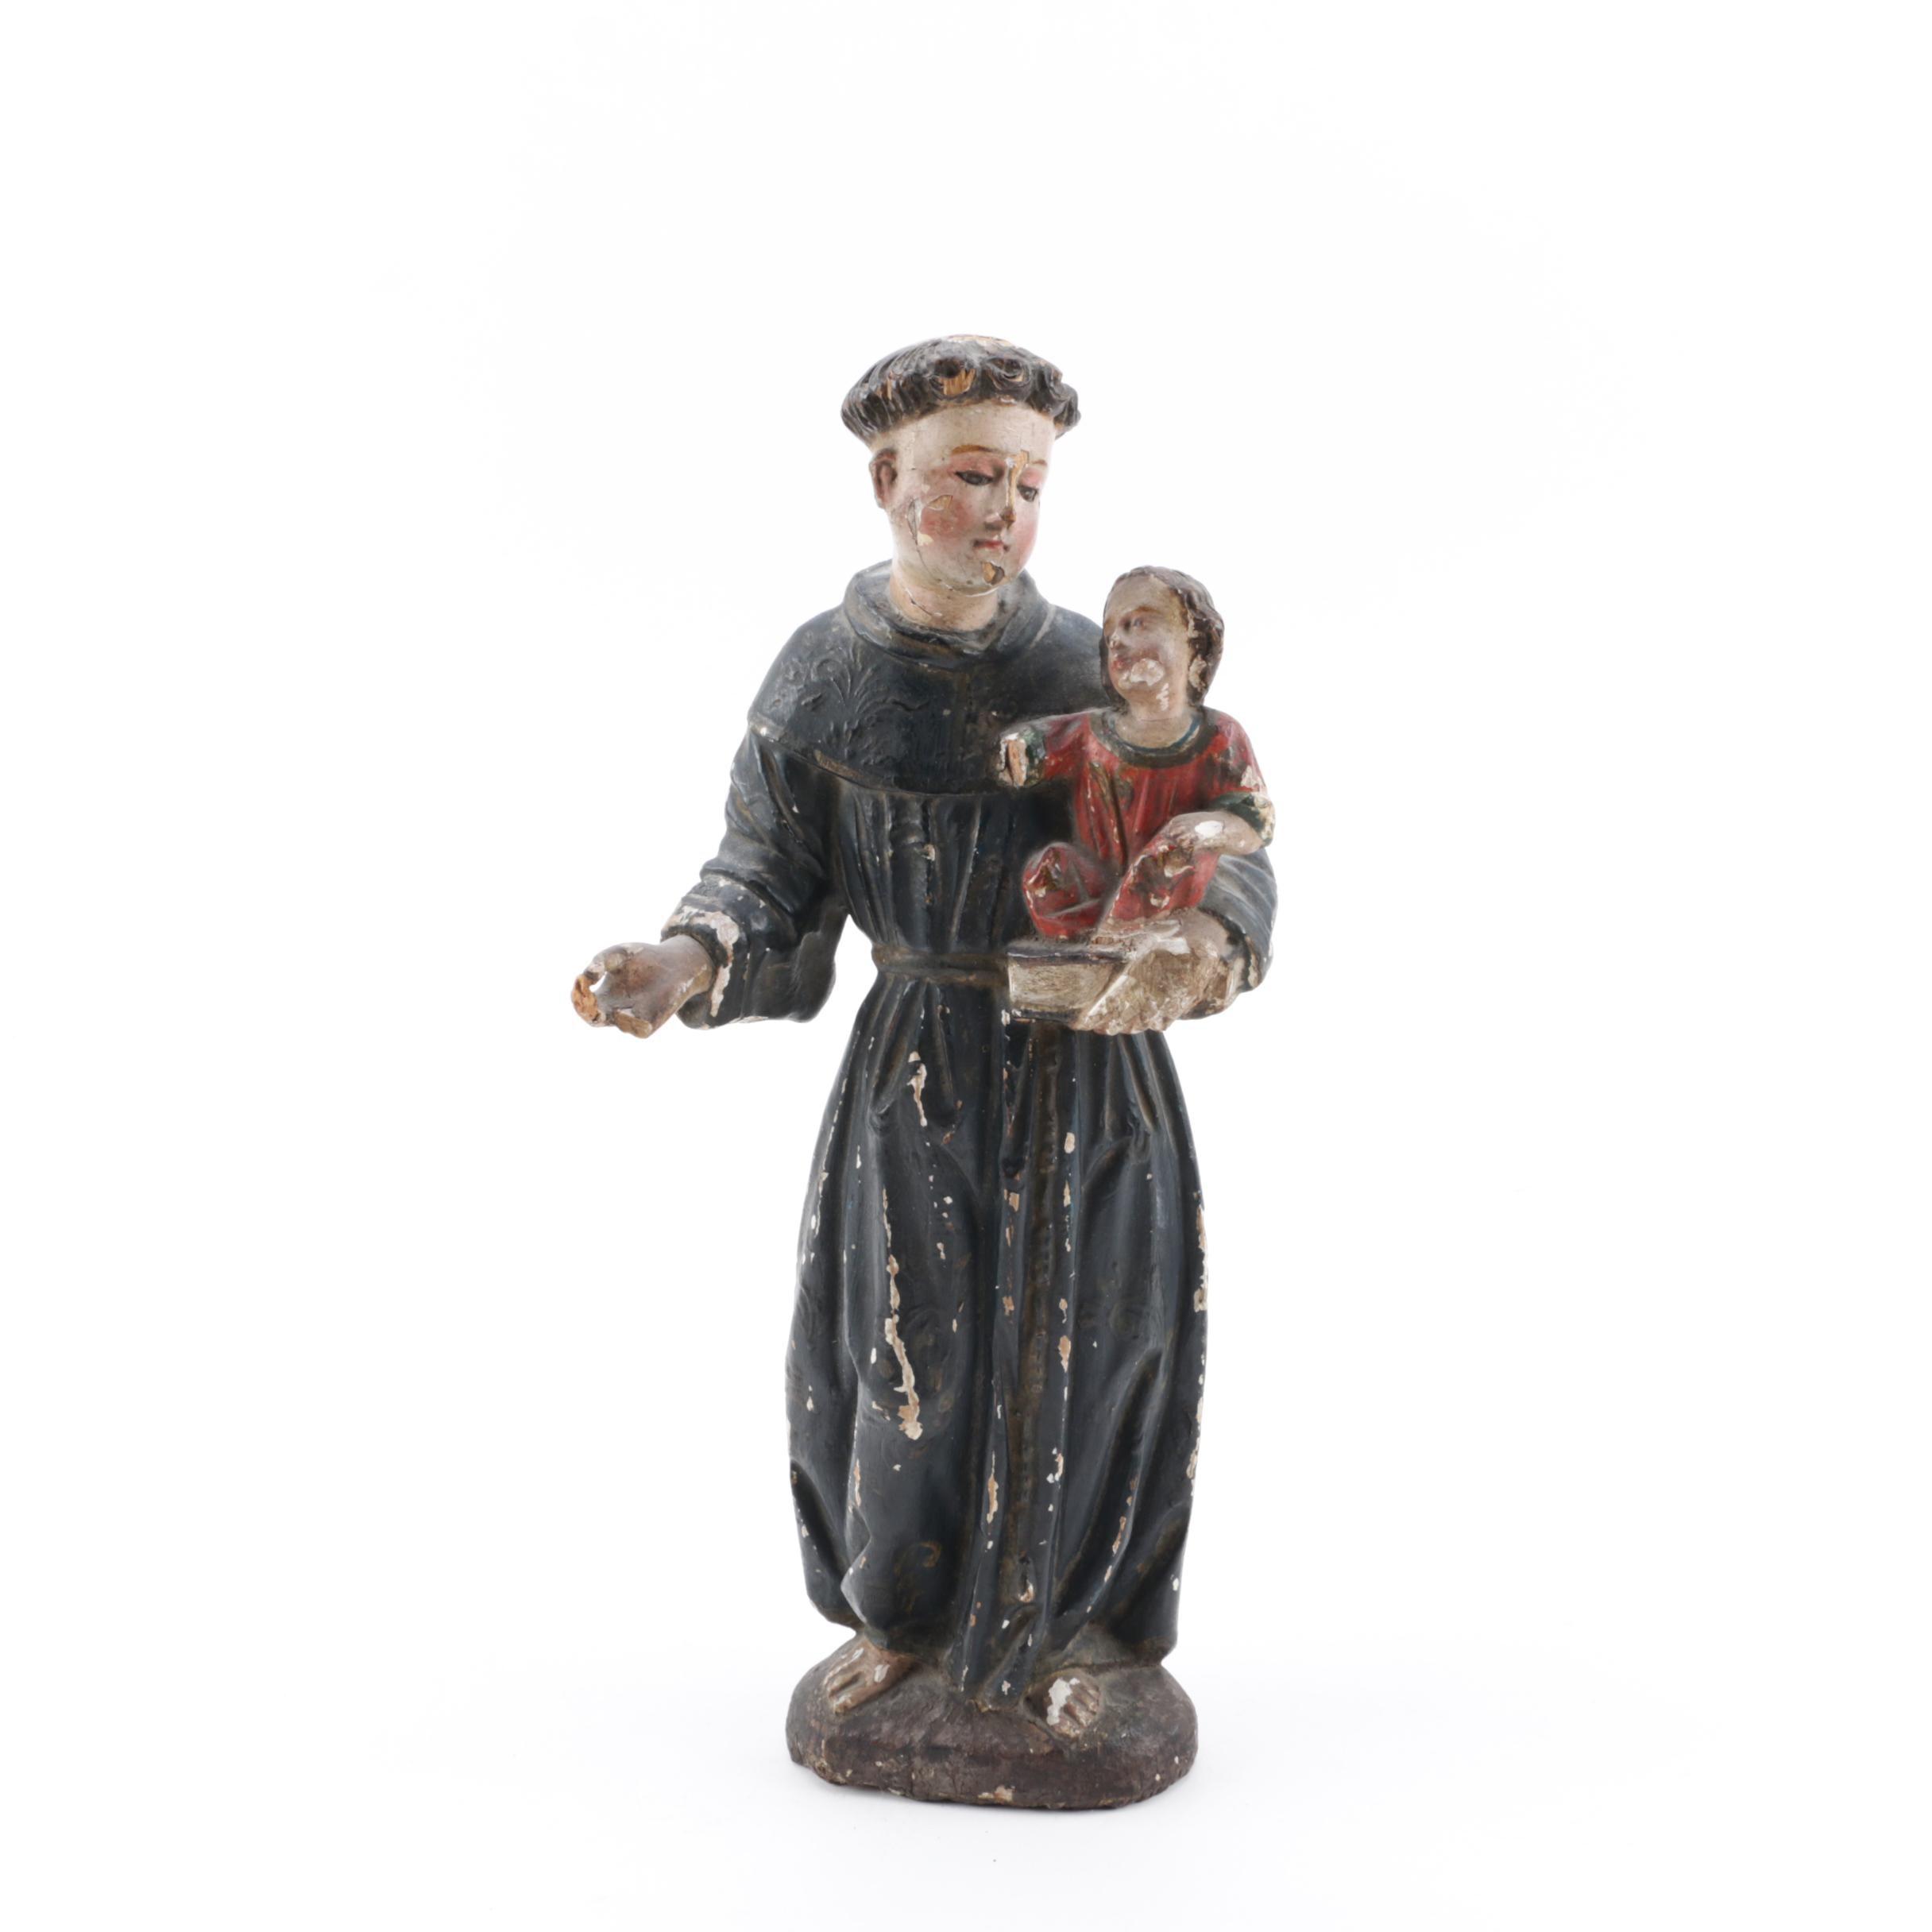 Antique Polychrome Wood Statue of Saint Anthony